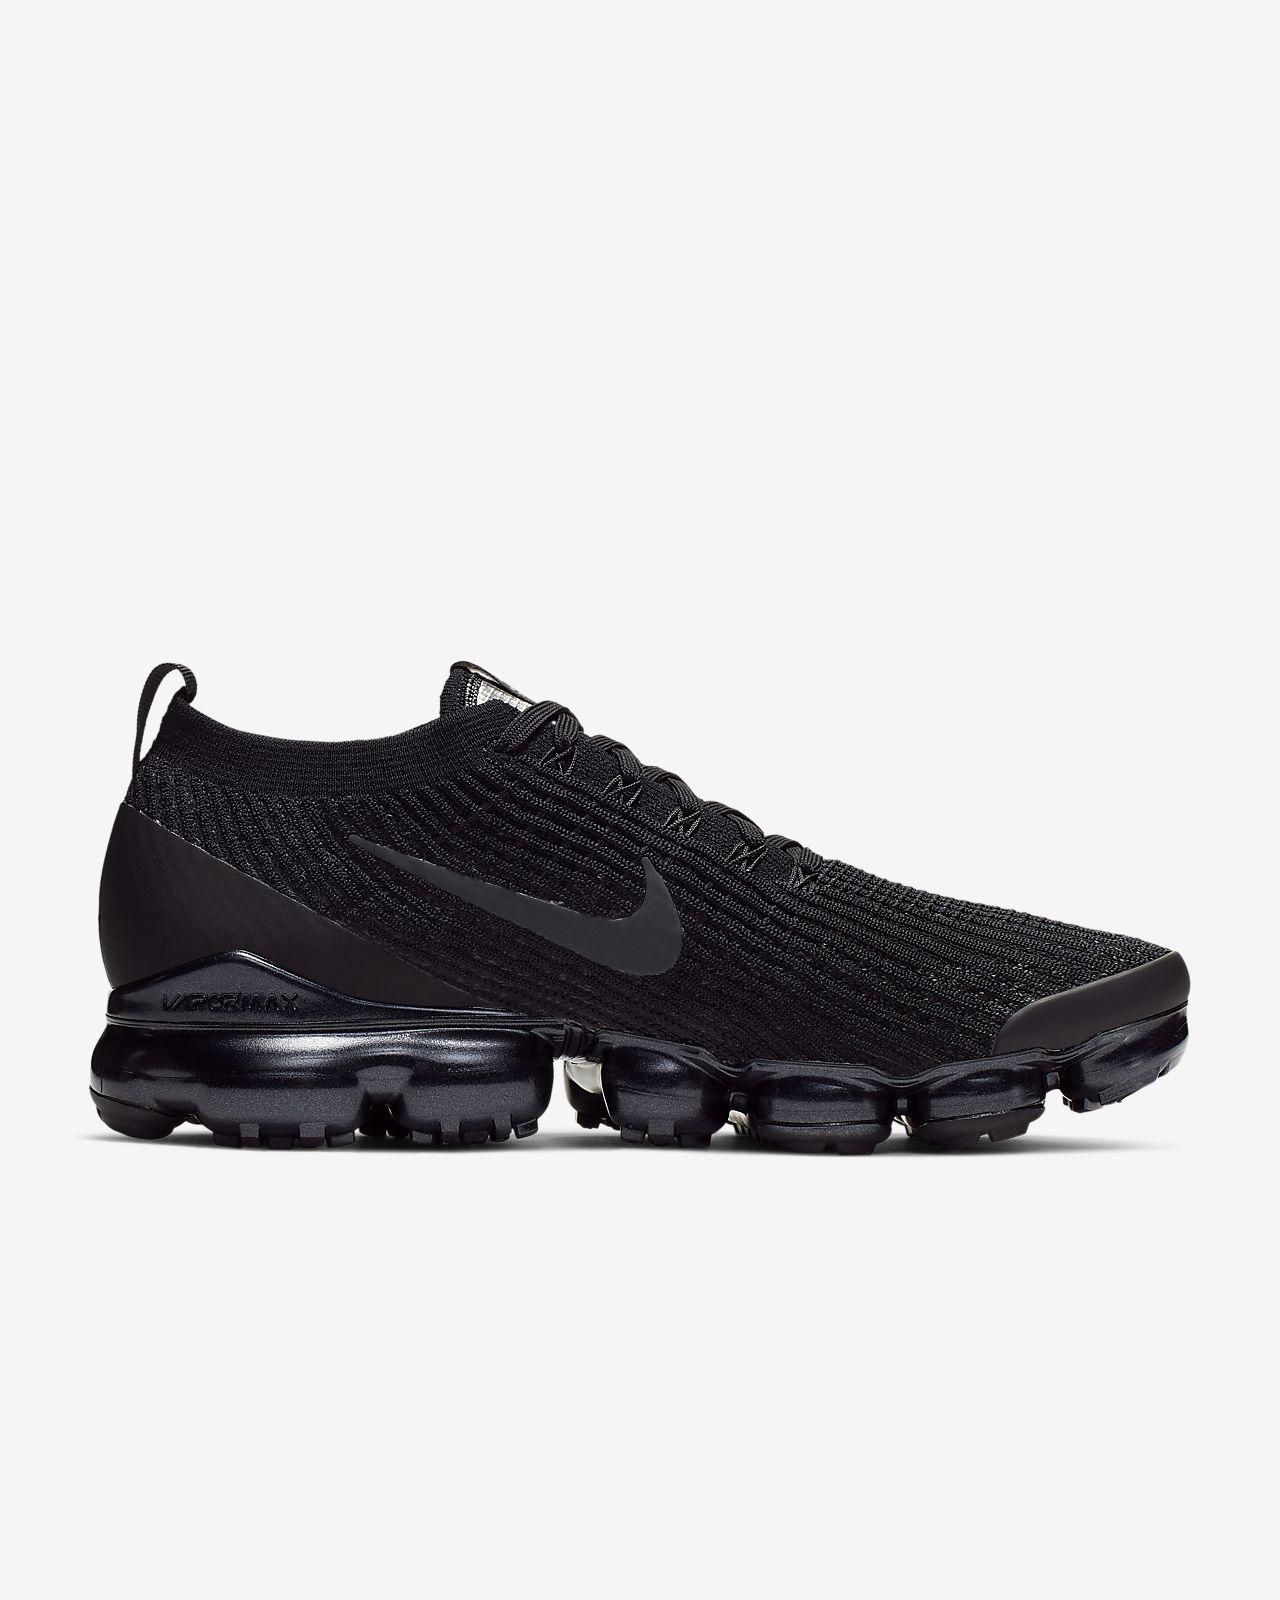 Chaussure Nike Pour Homme 3 Air Vapormax Flyknit FKc3lJT1